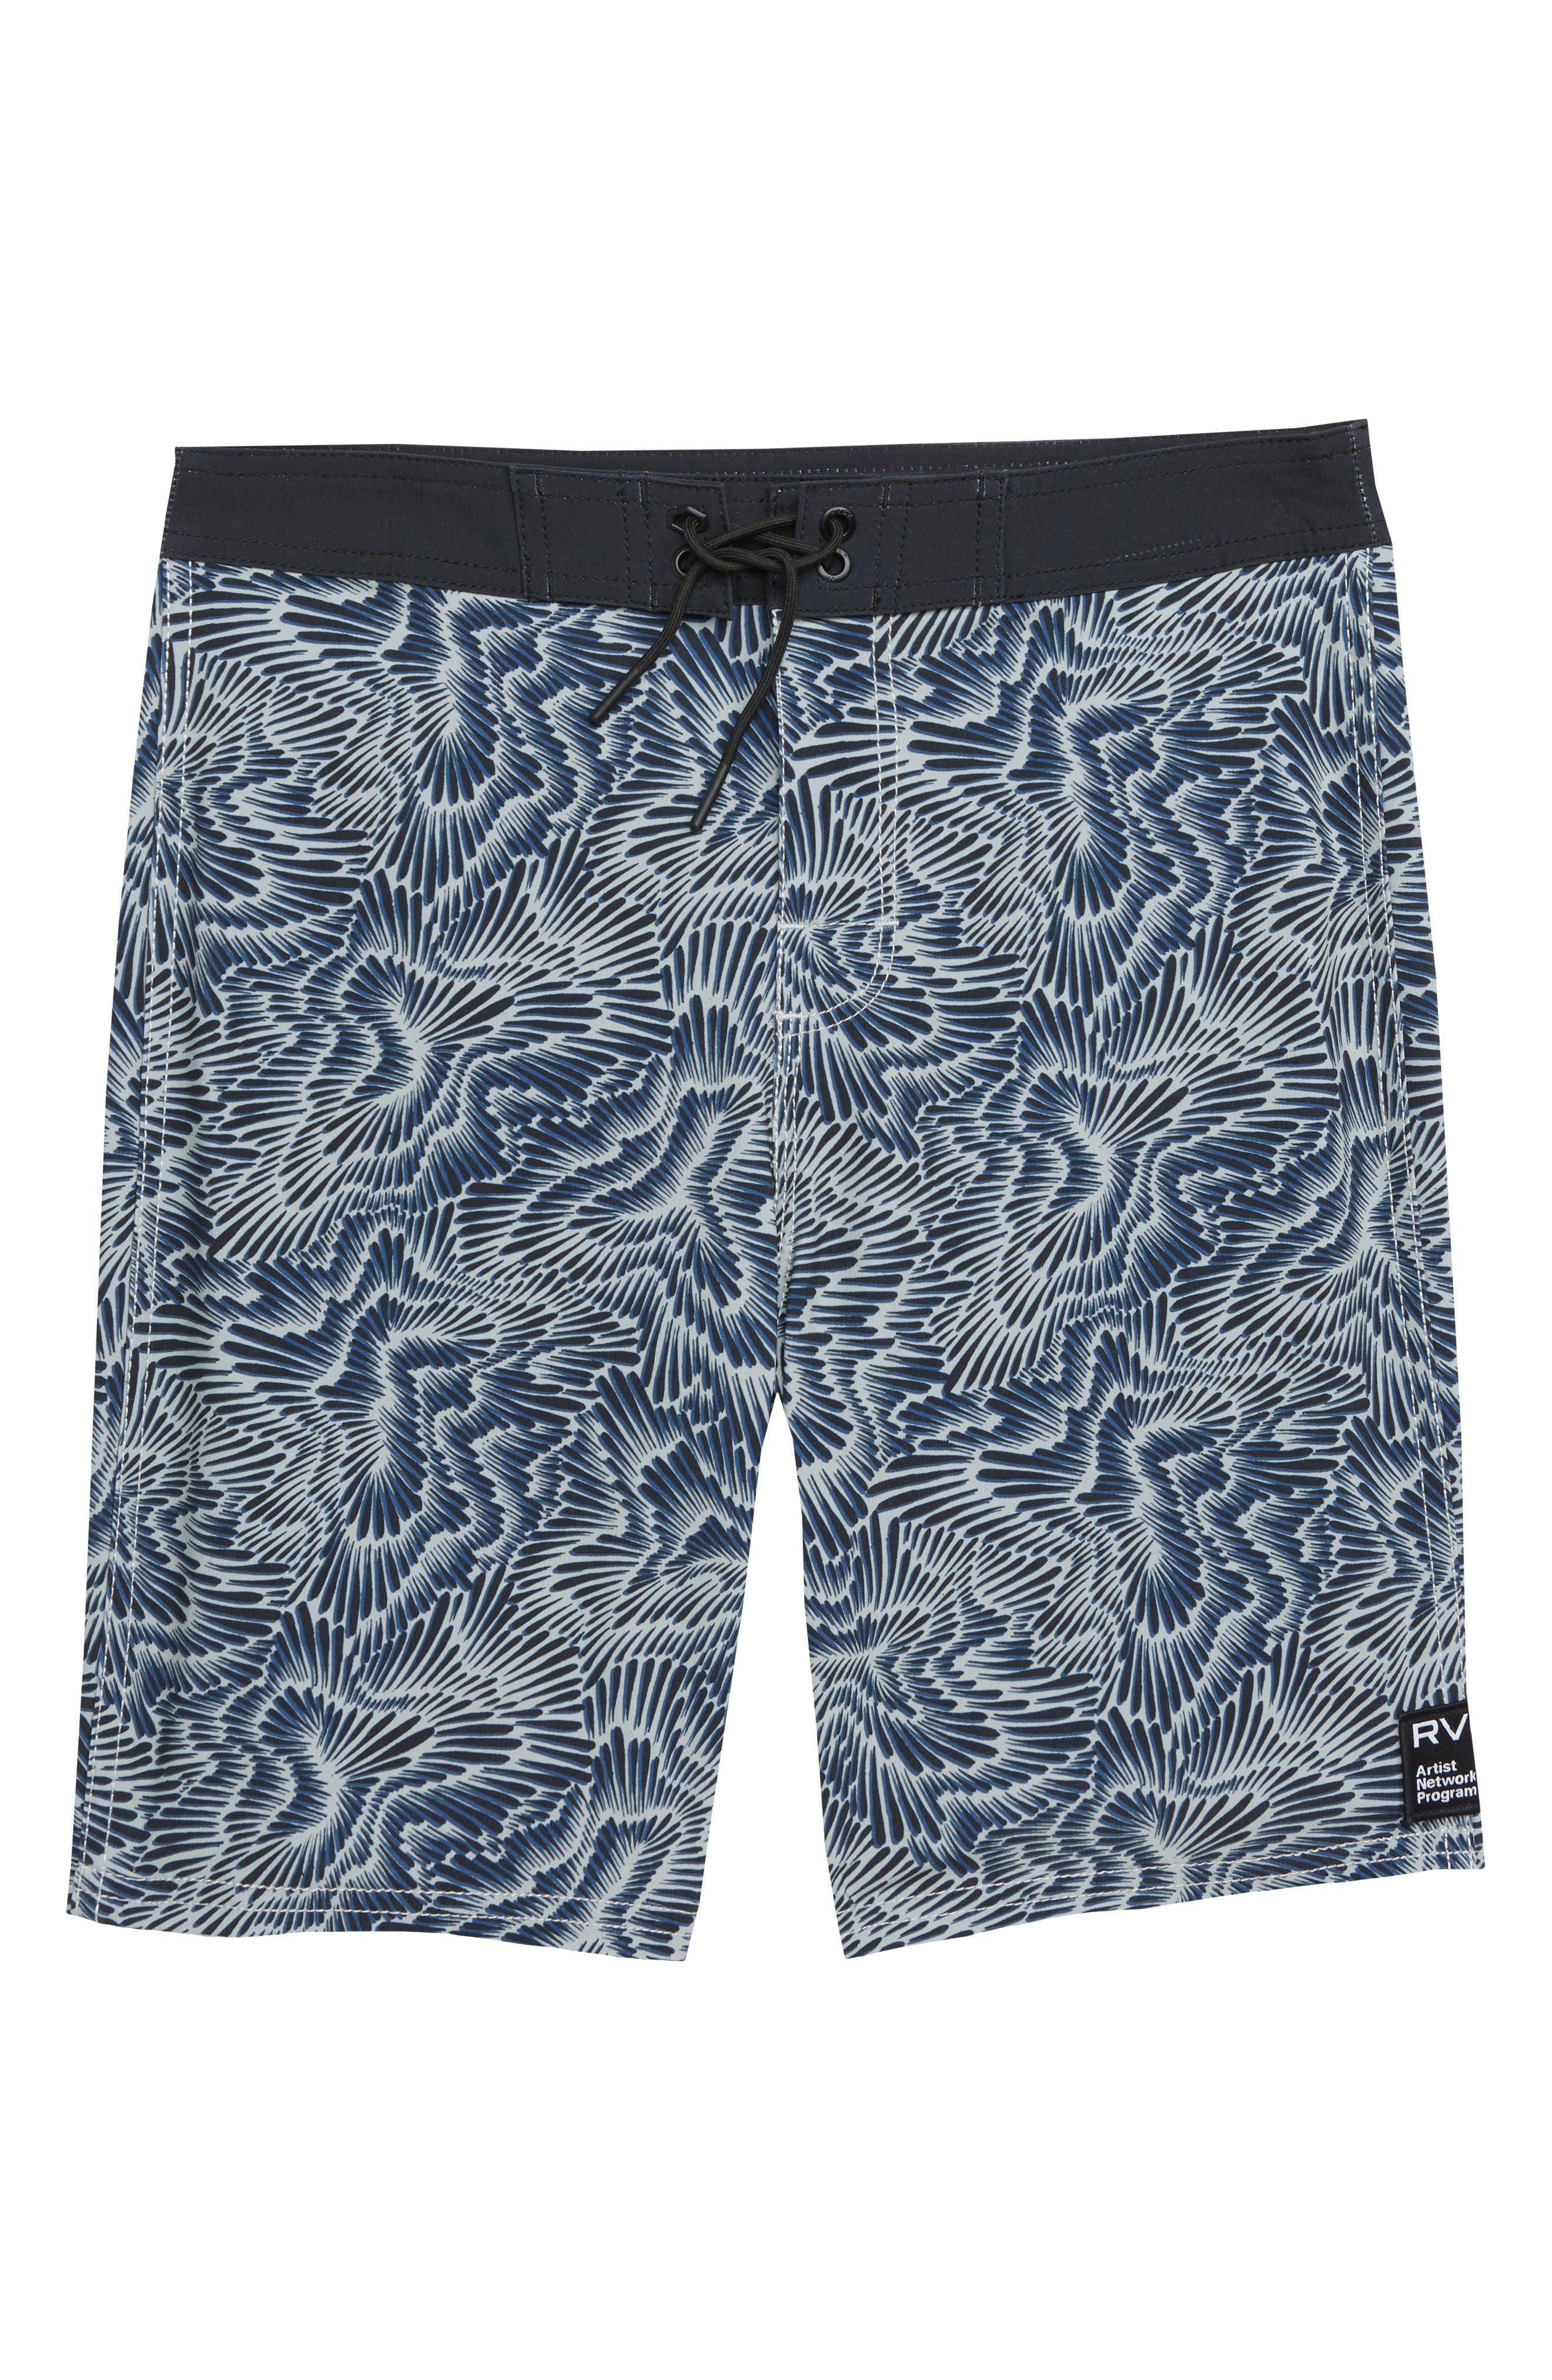 Halston Board Shorts,                         Main,                         color, MIRAGE